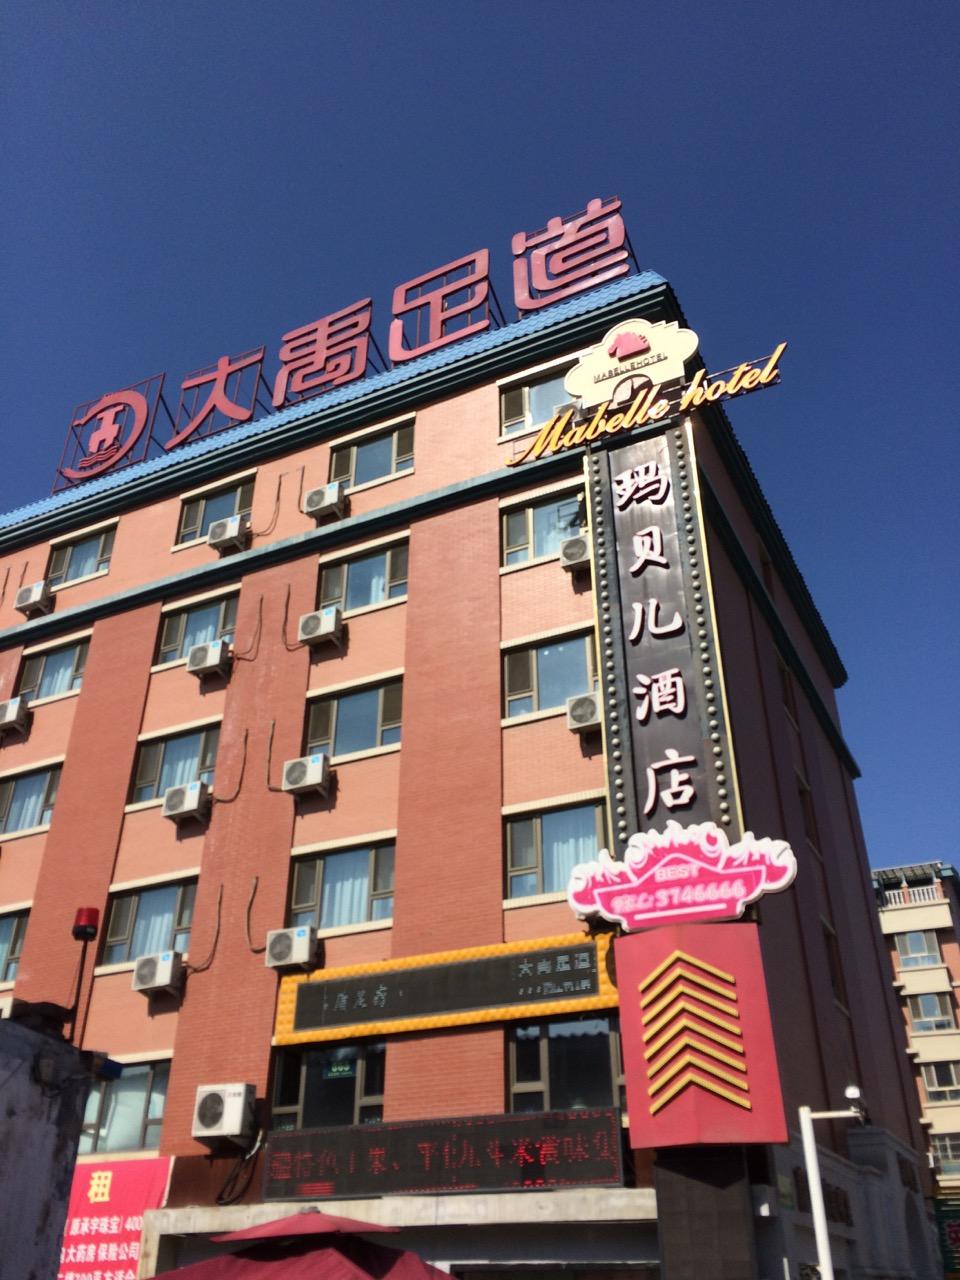 Mabelle Hotel in Urumqi